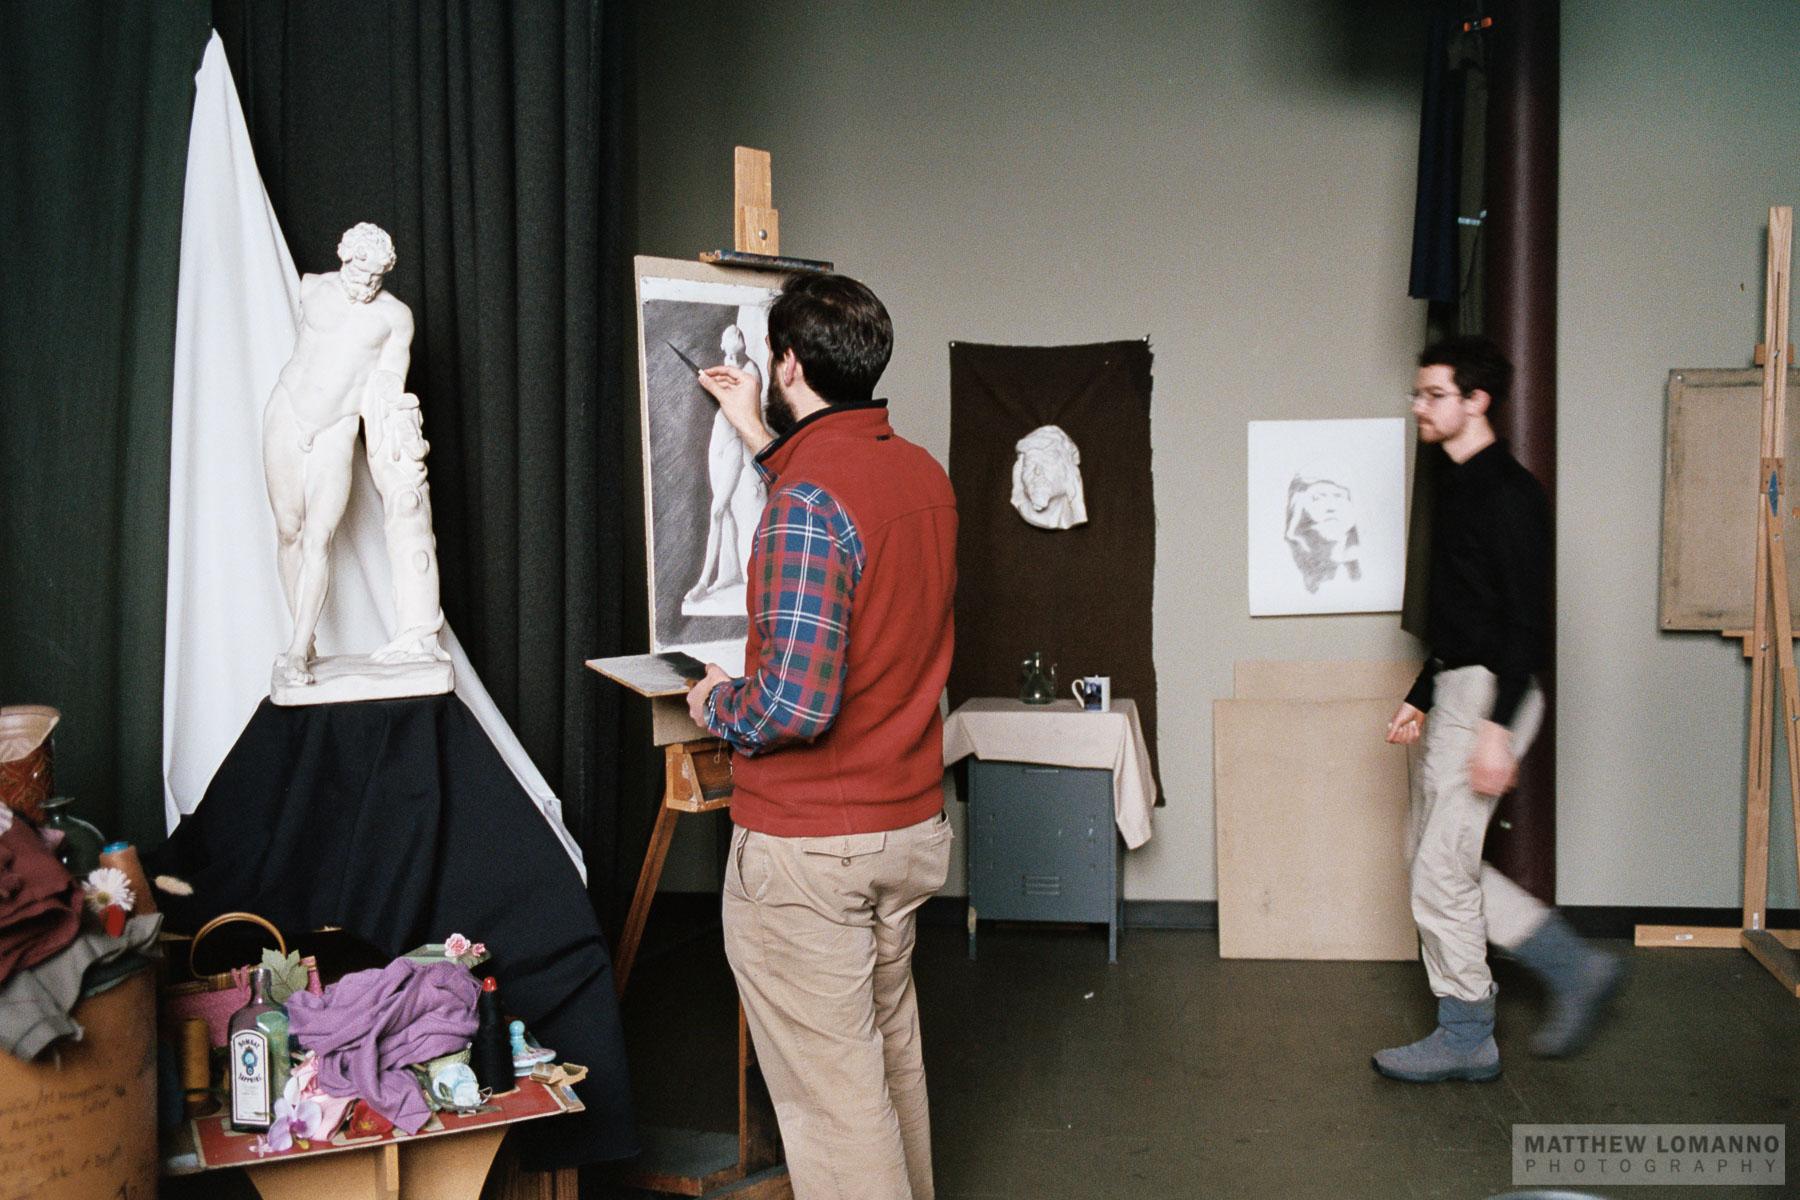 Ingbretson_atelier_working_by_Lomanno-8.jpg